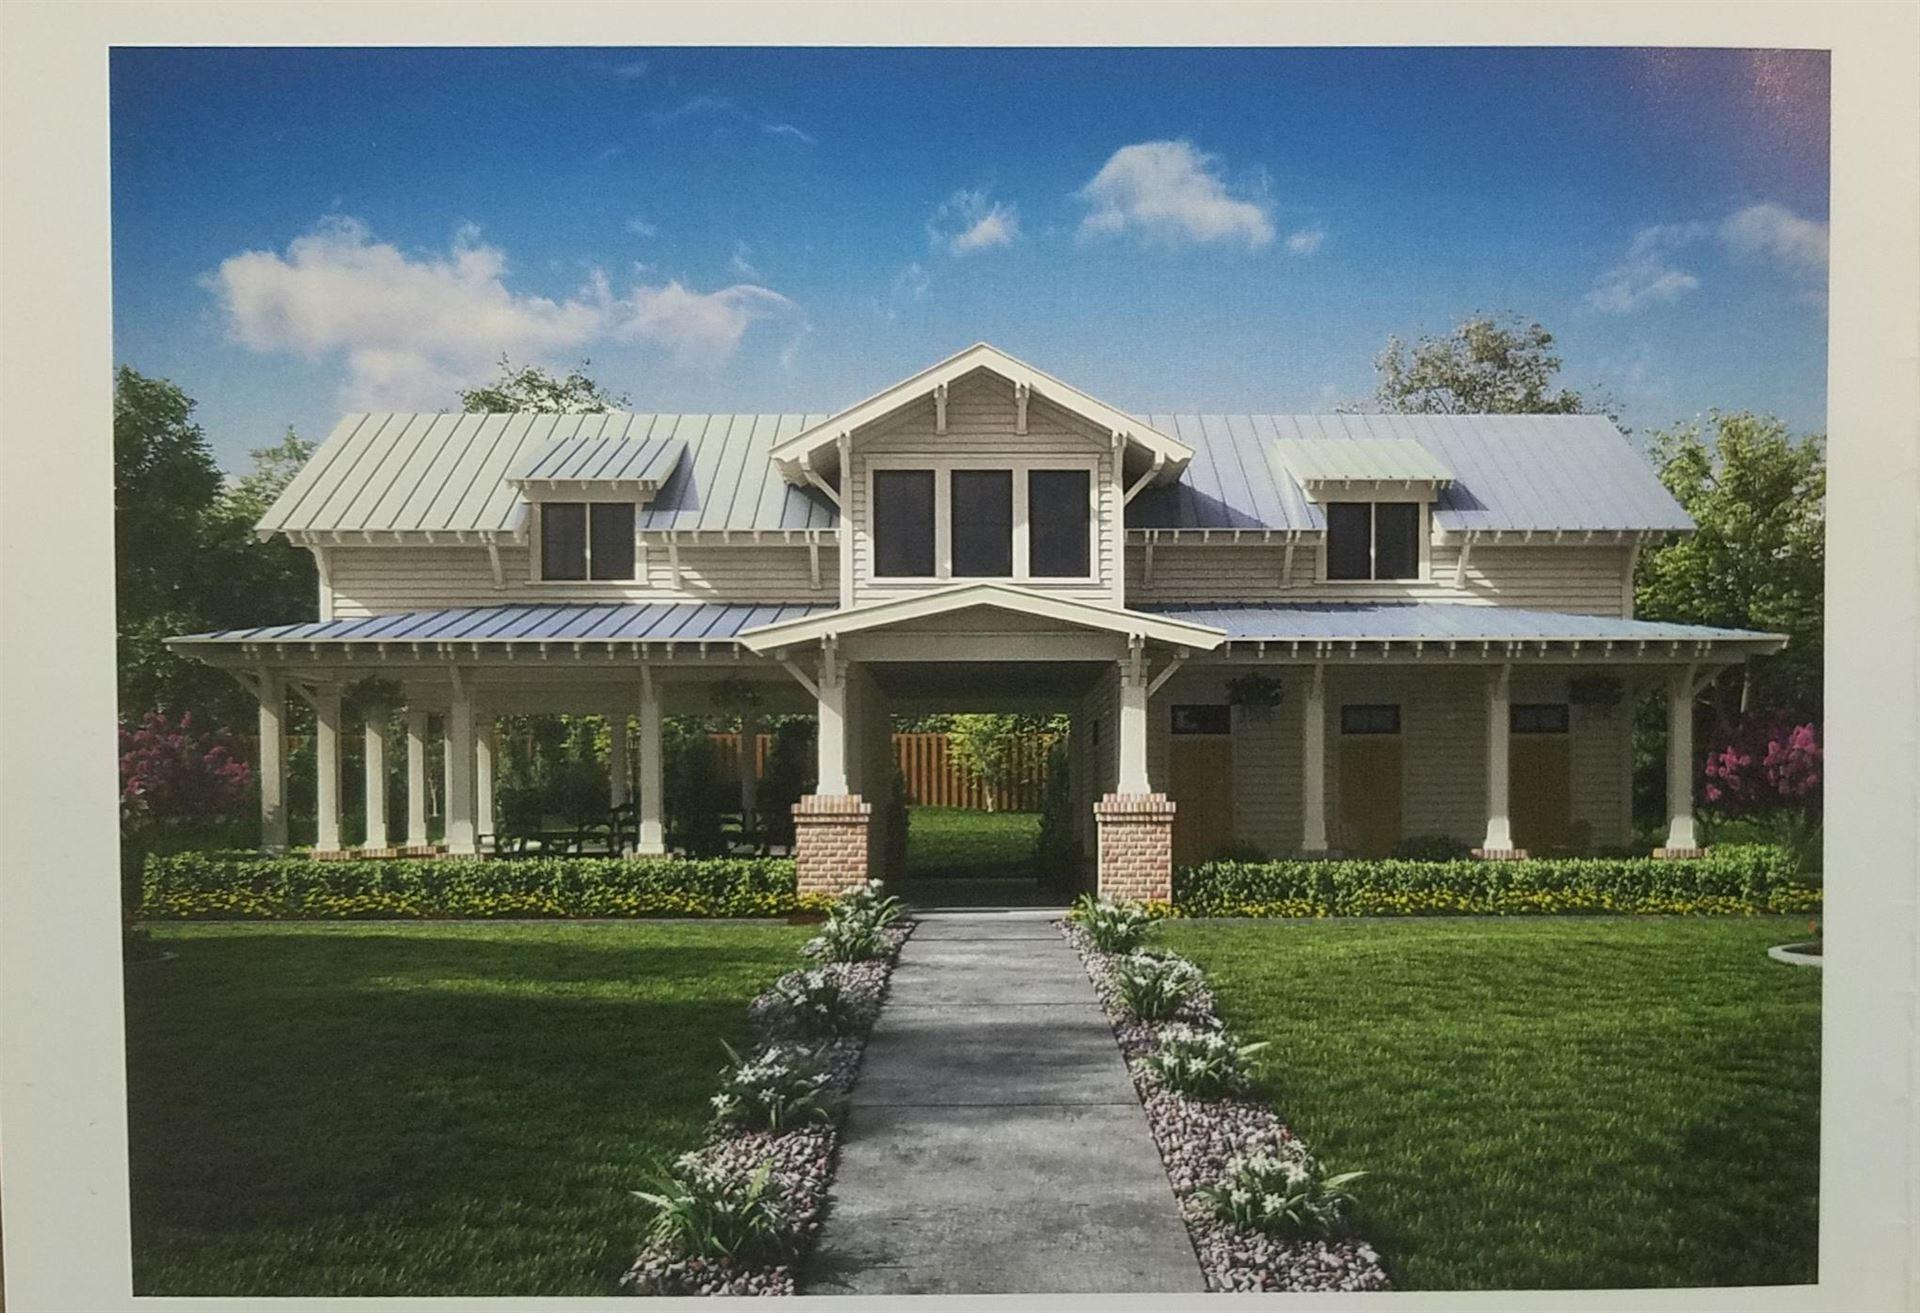 Photo of 633 Green Farm Way, Spring Hill, TN 37174 (MLS # 2089988)